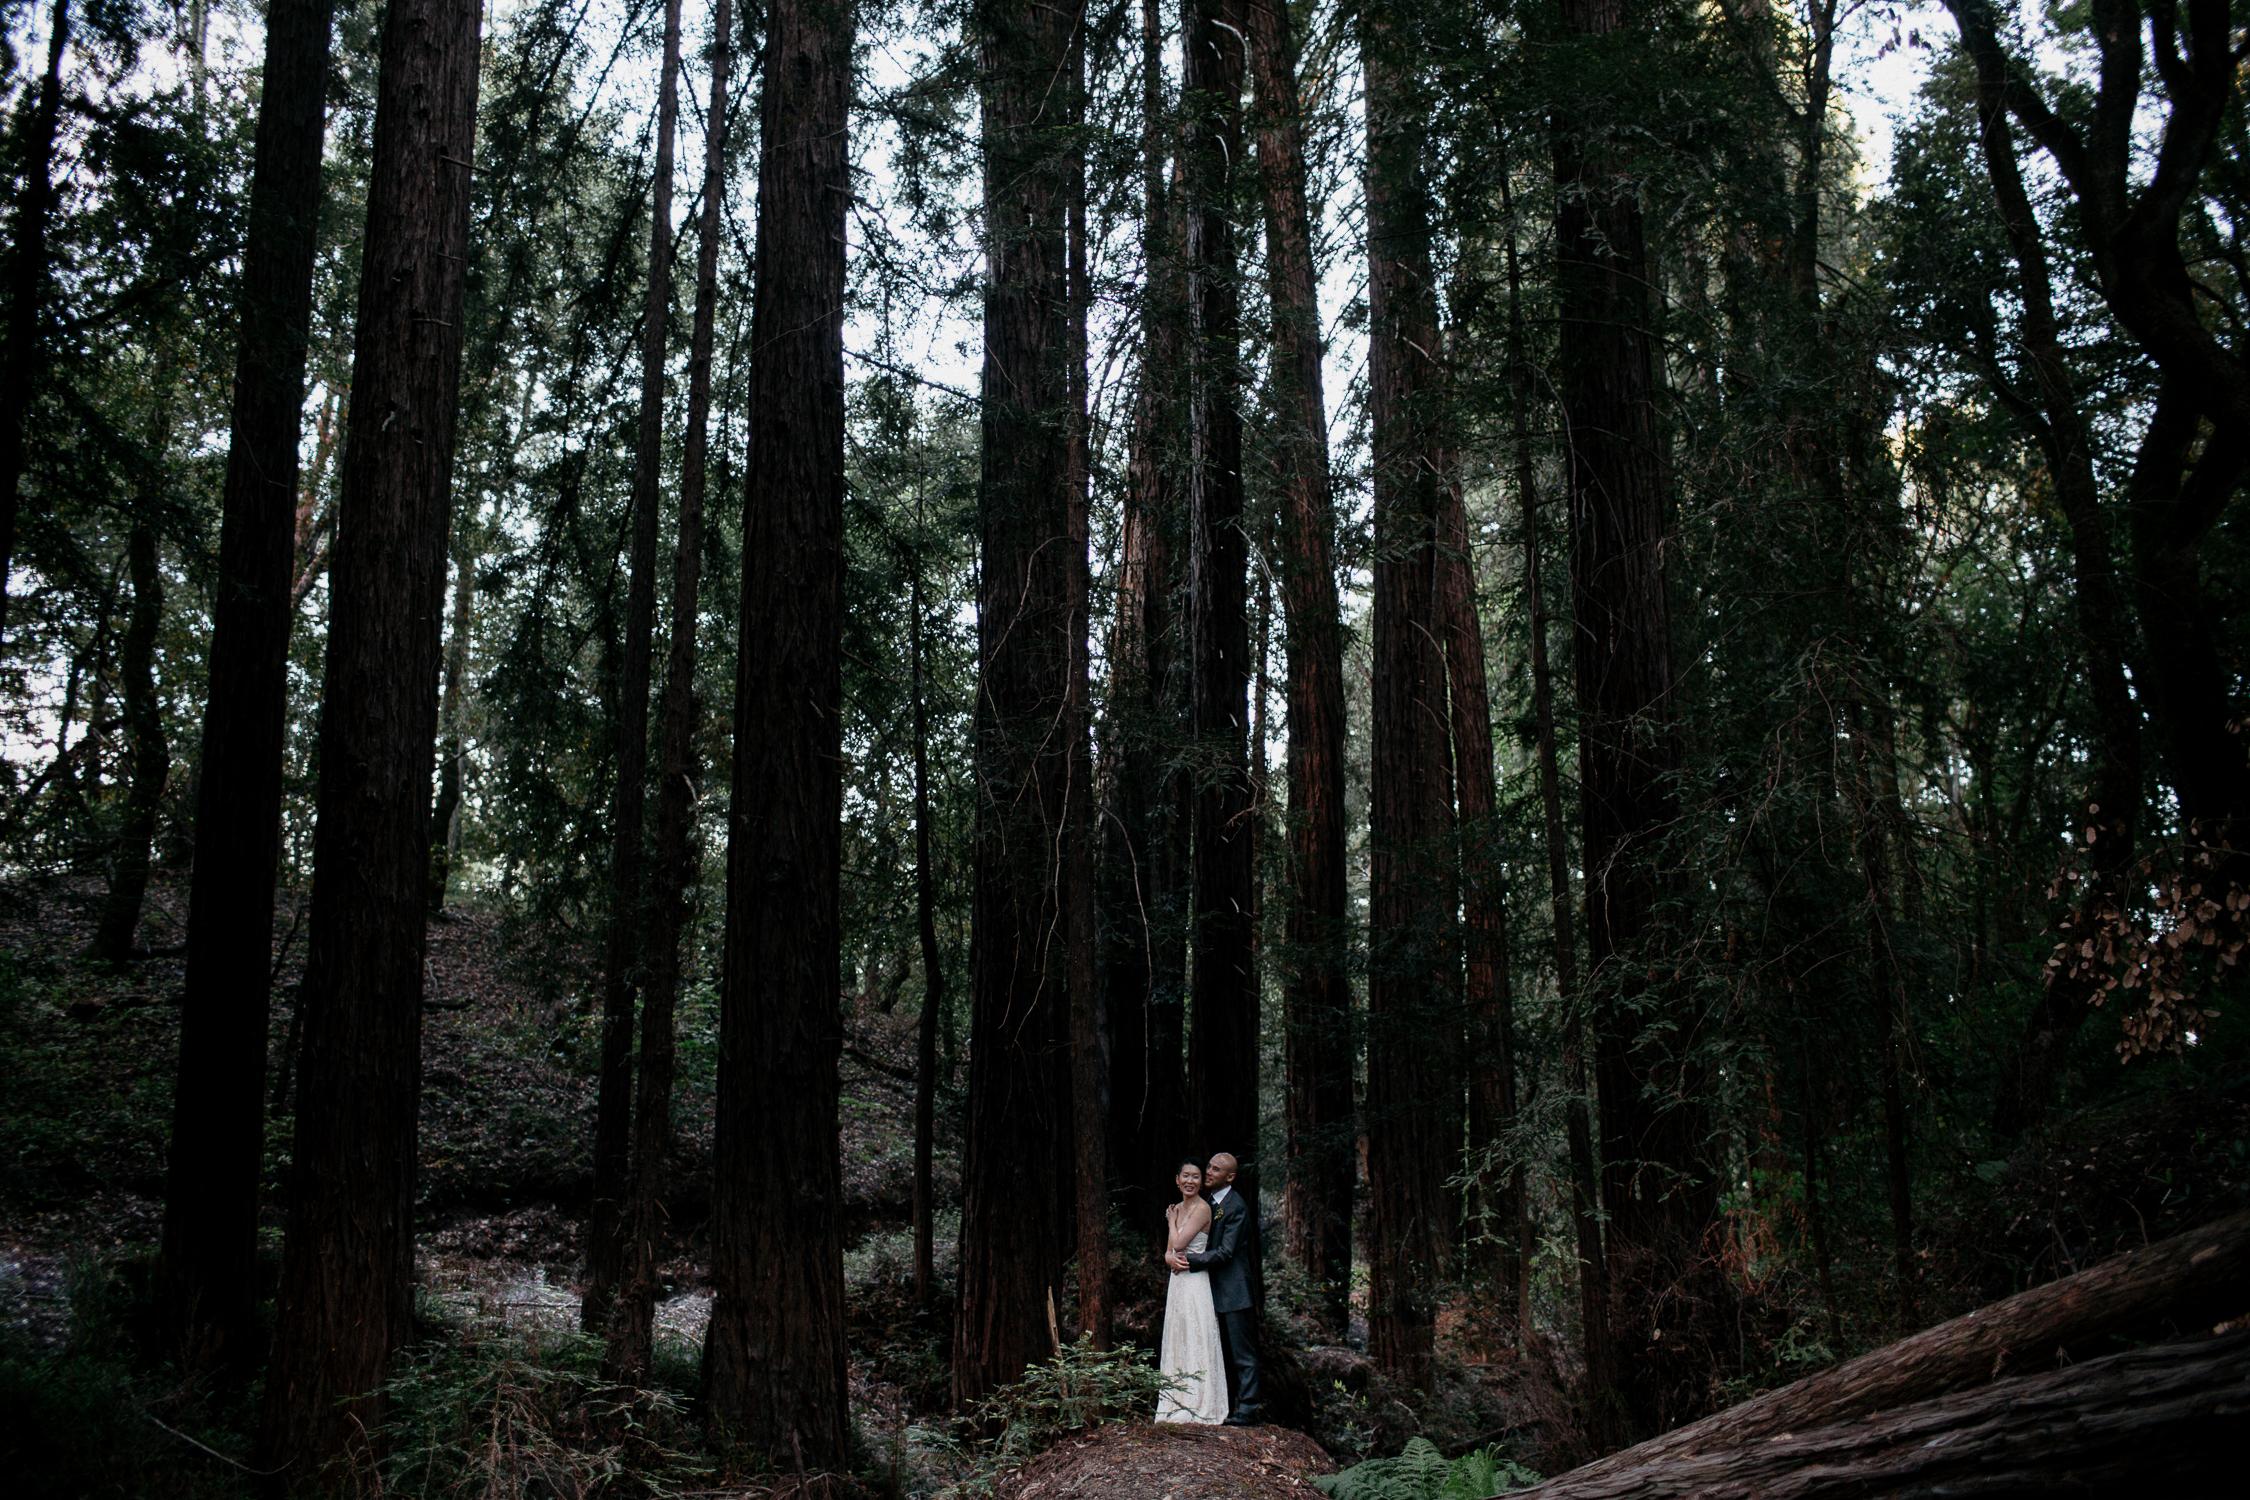 gretchen_gause_sonoma_california_wedding_photo_028.jpg